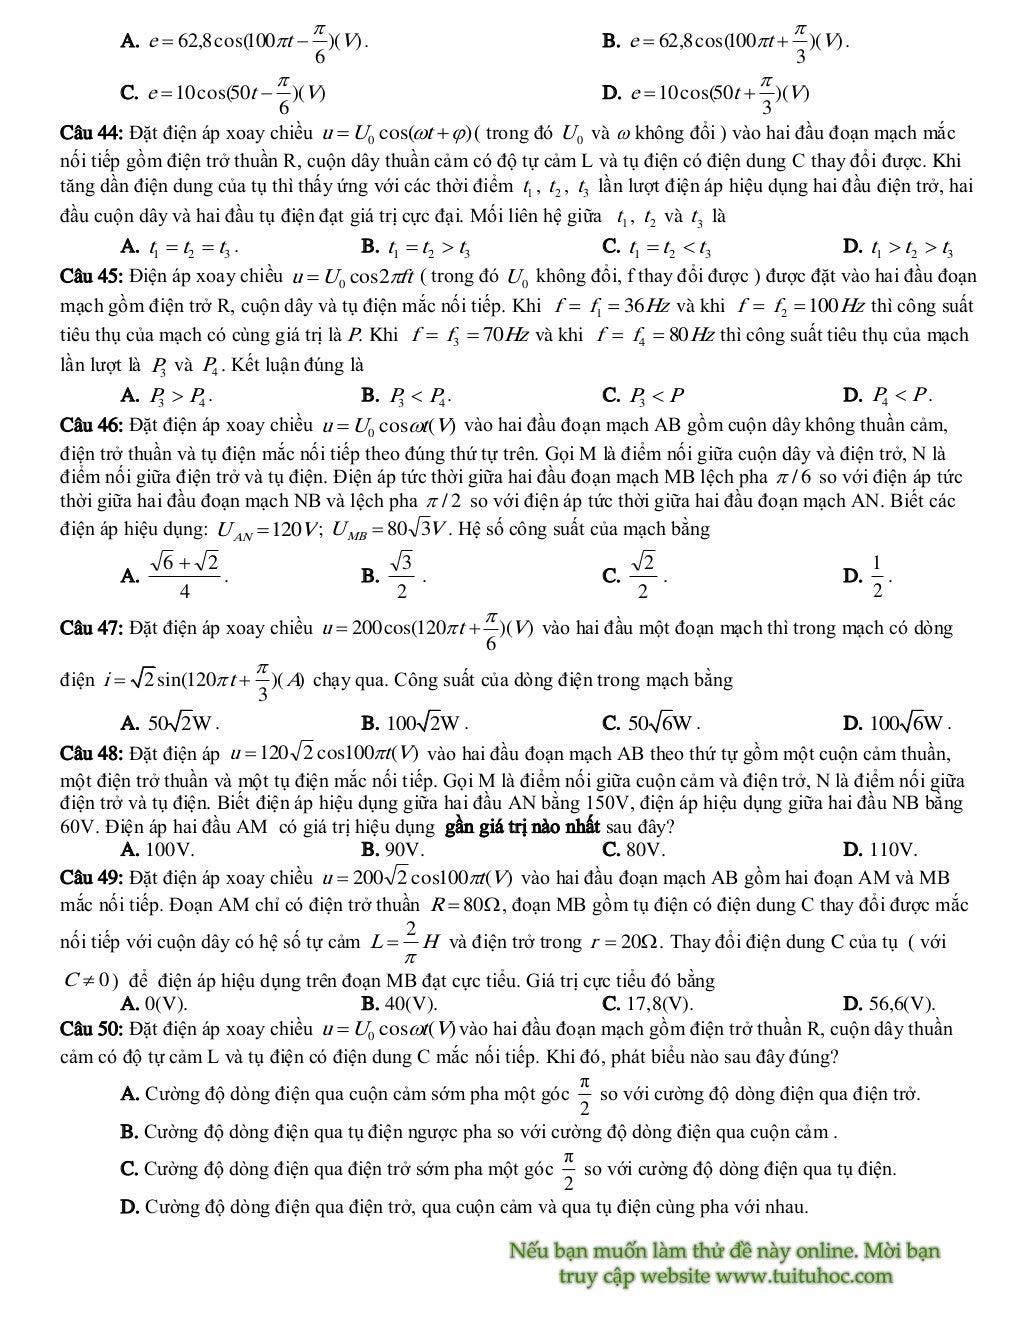 de thi thu vat ly trang 5